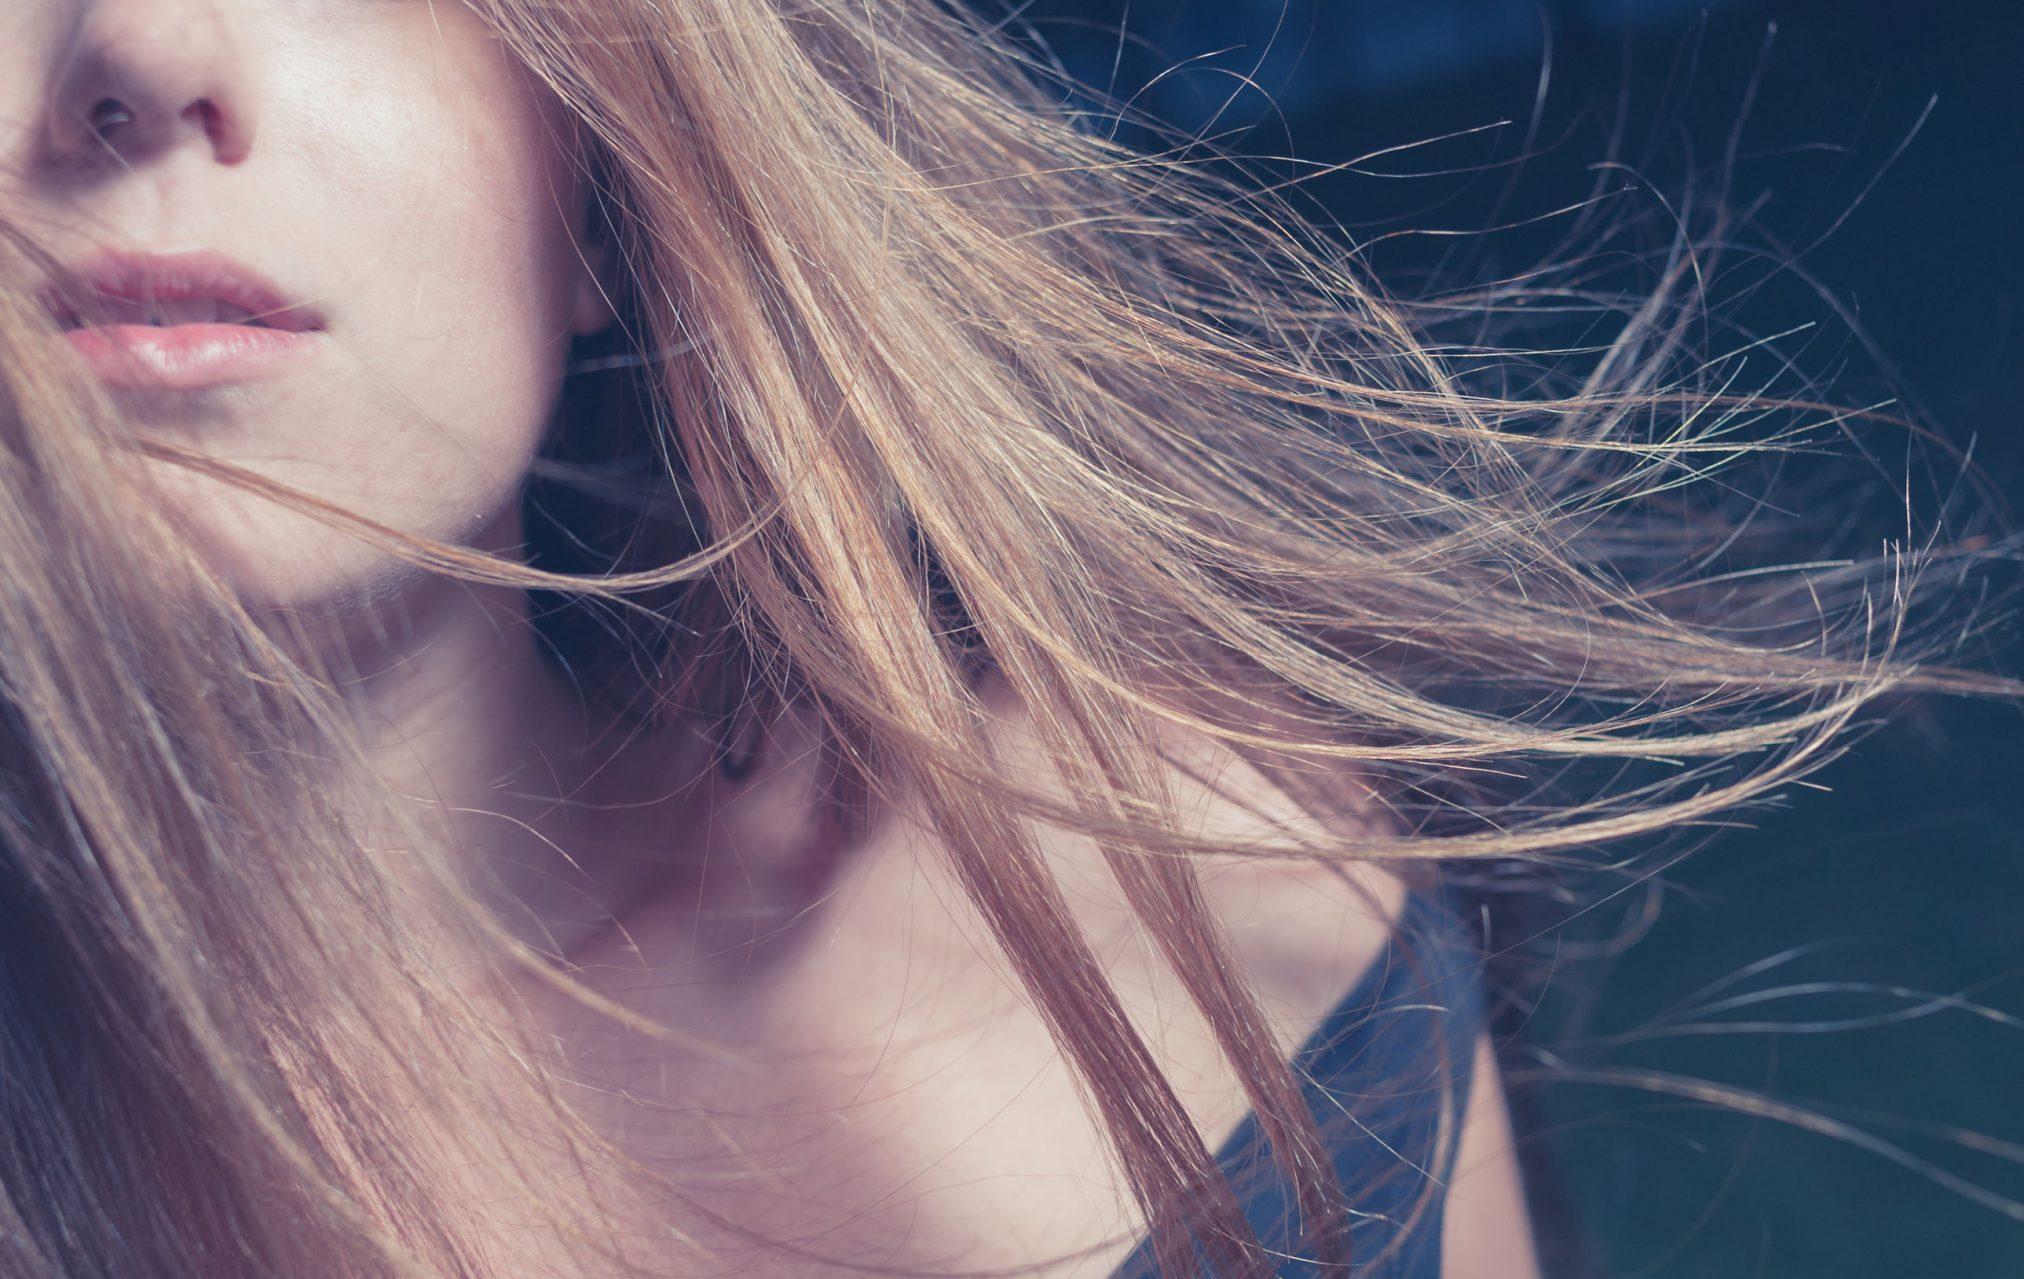 close up of half a woman's face